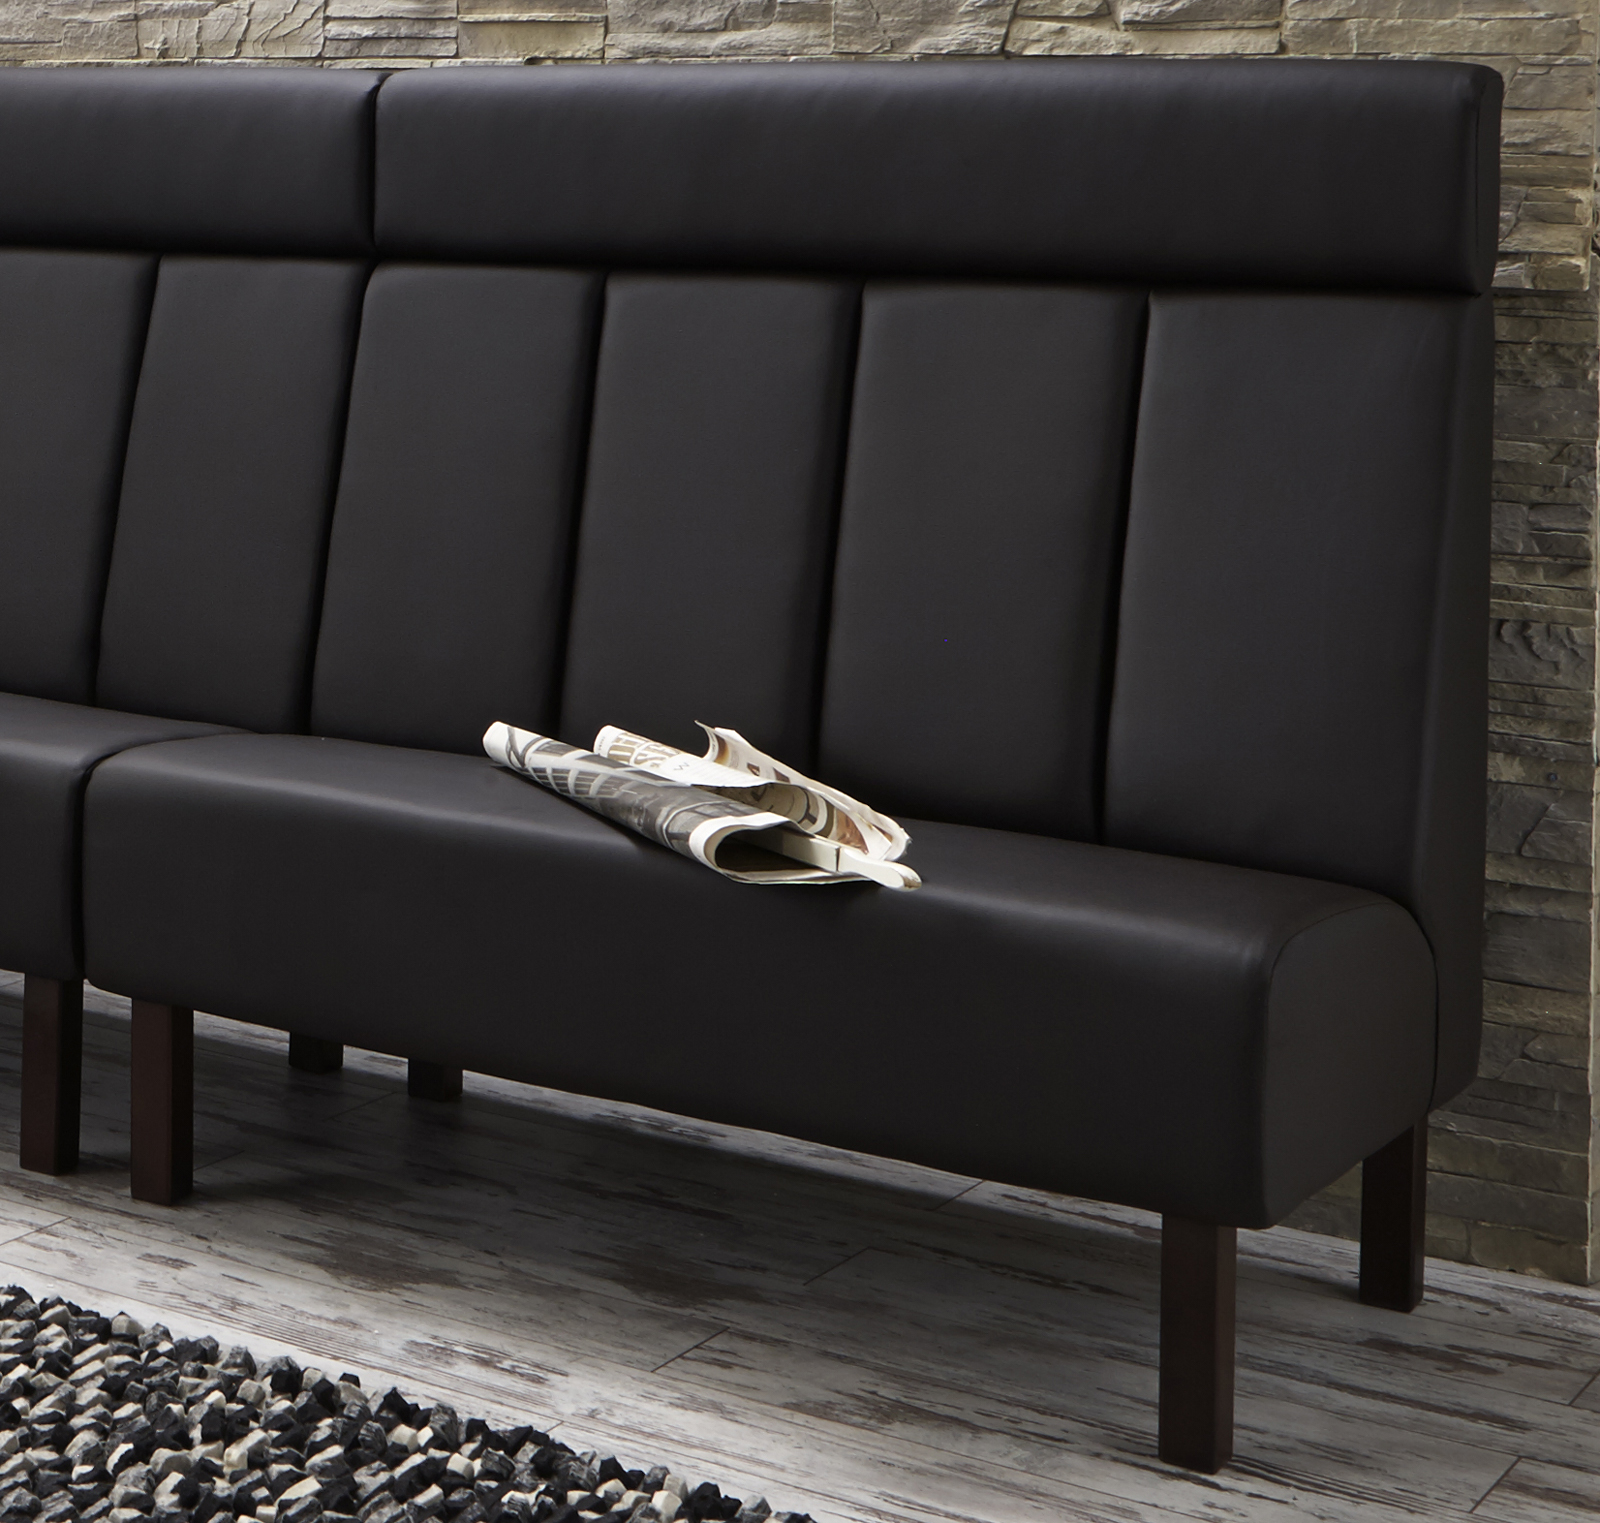 sam esszimmer system bank braun austin ma anfertigung. Black Bedroom Furniture Sets. Home Design Ideas